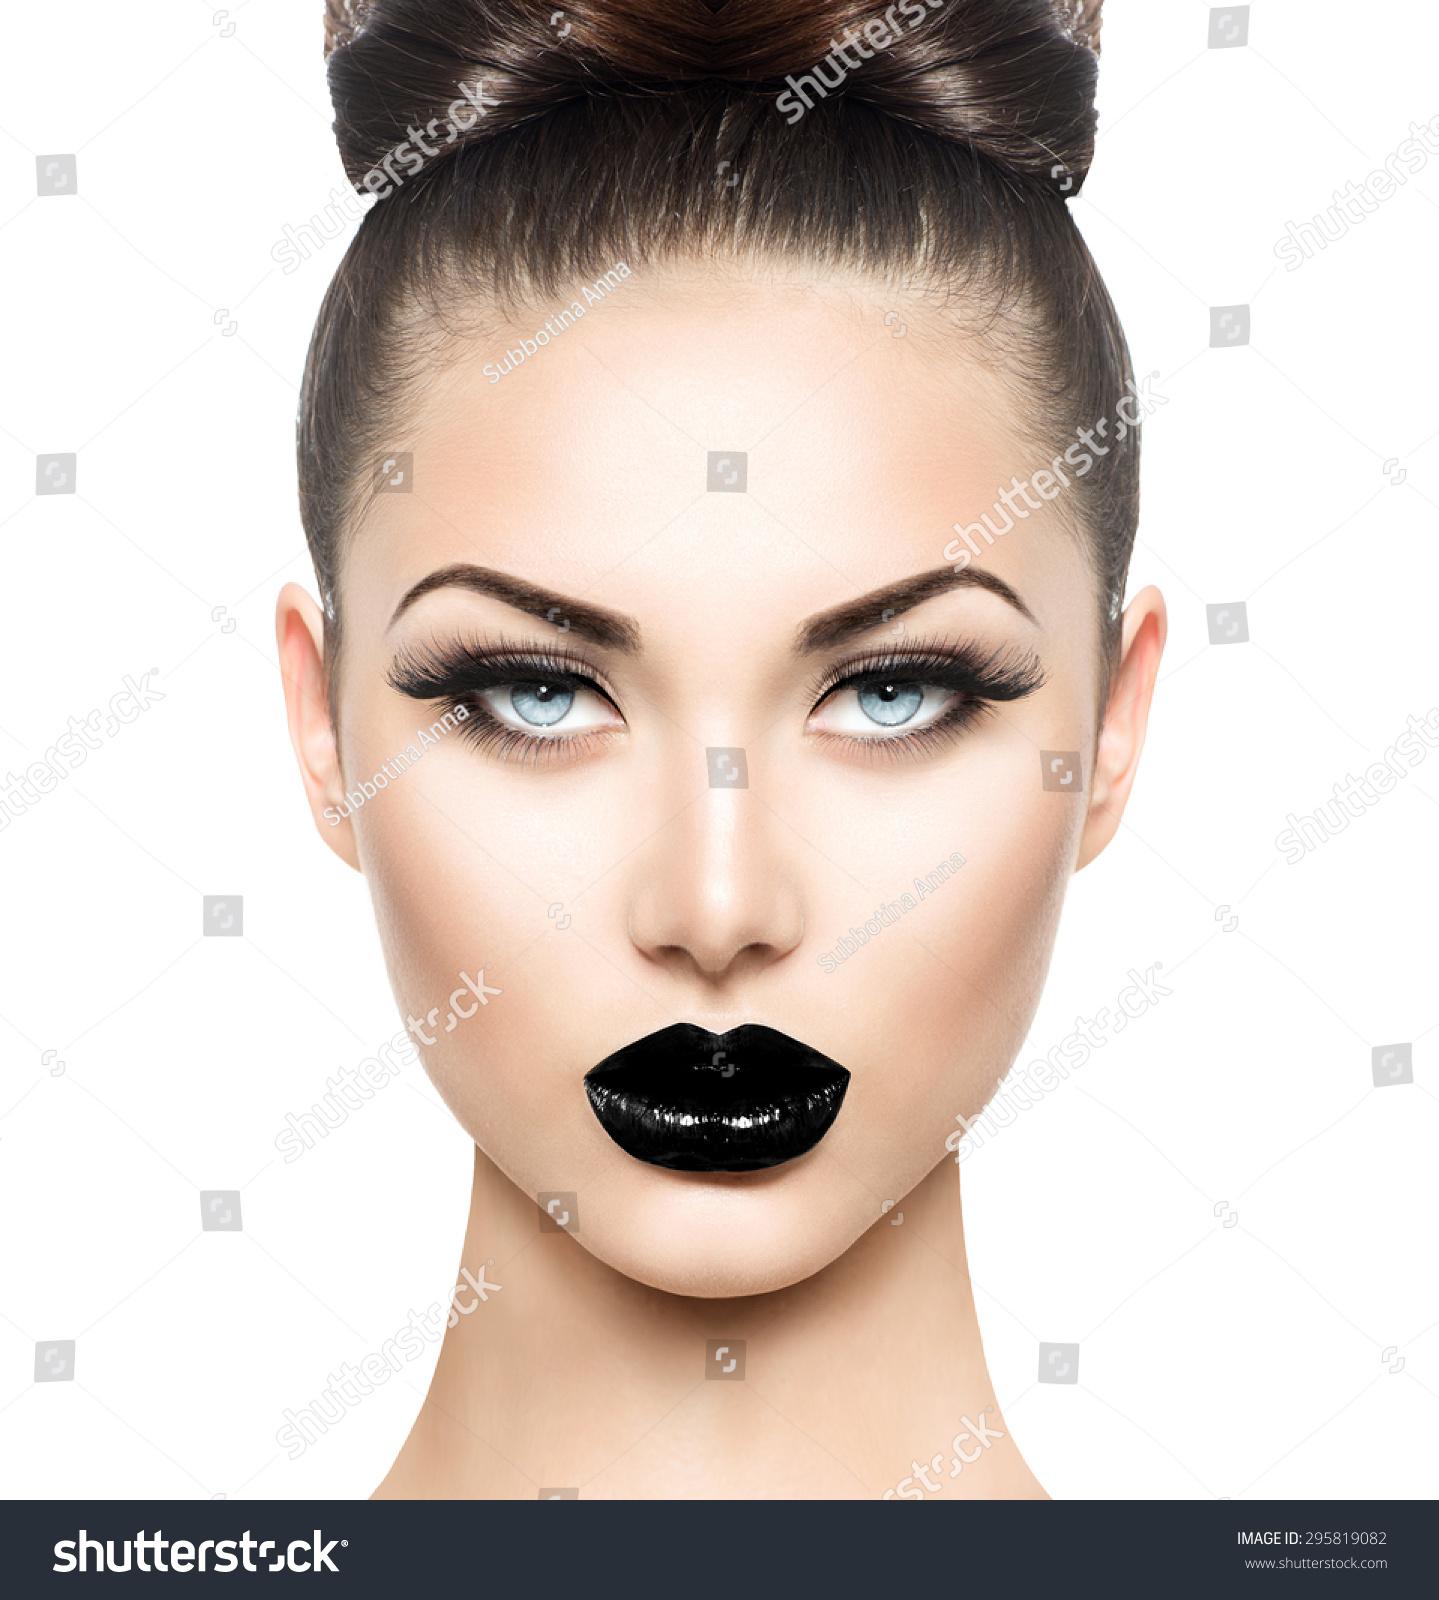 High Fashion Beauty Model Girl Black Stock Photo 295819082 Shutterstock